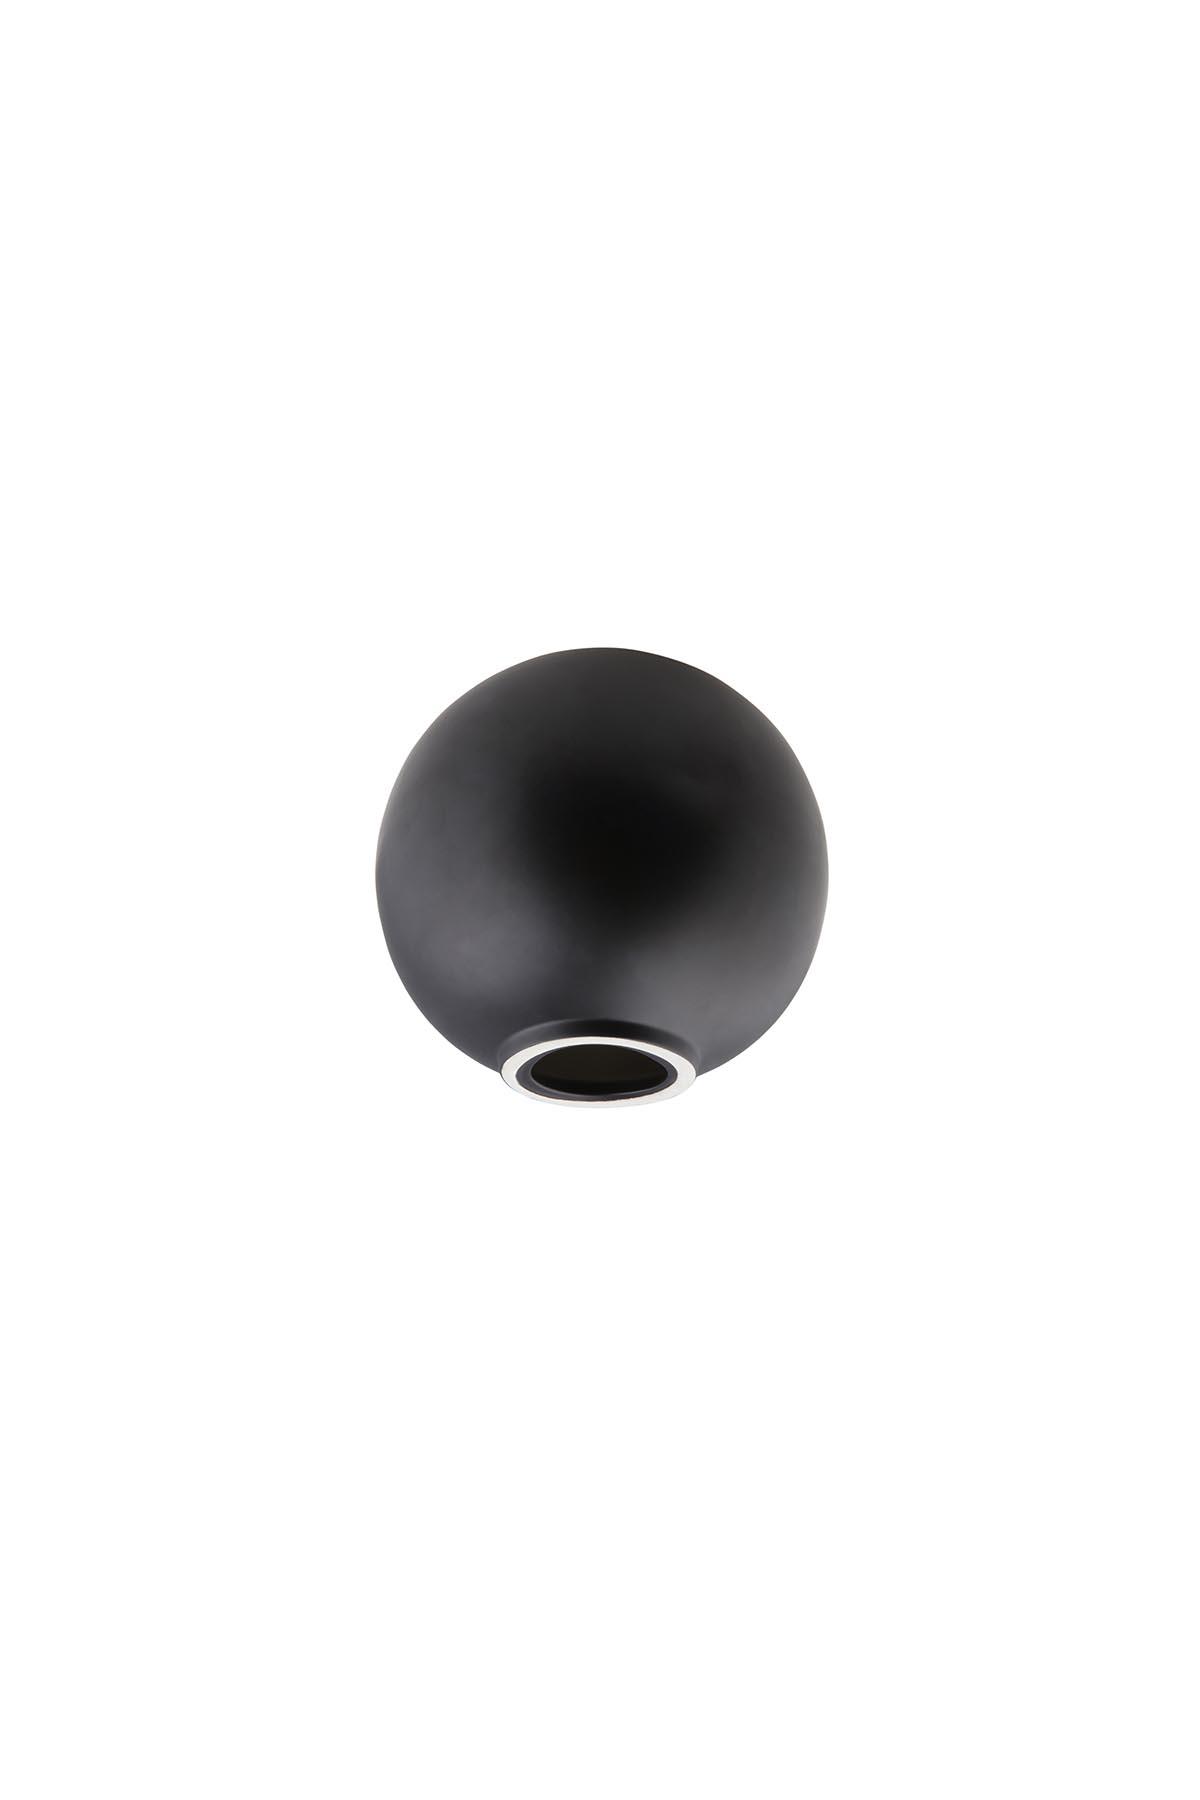 Kütahya Porselen Modern 14 cm Küre Mat Siyah